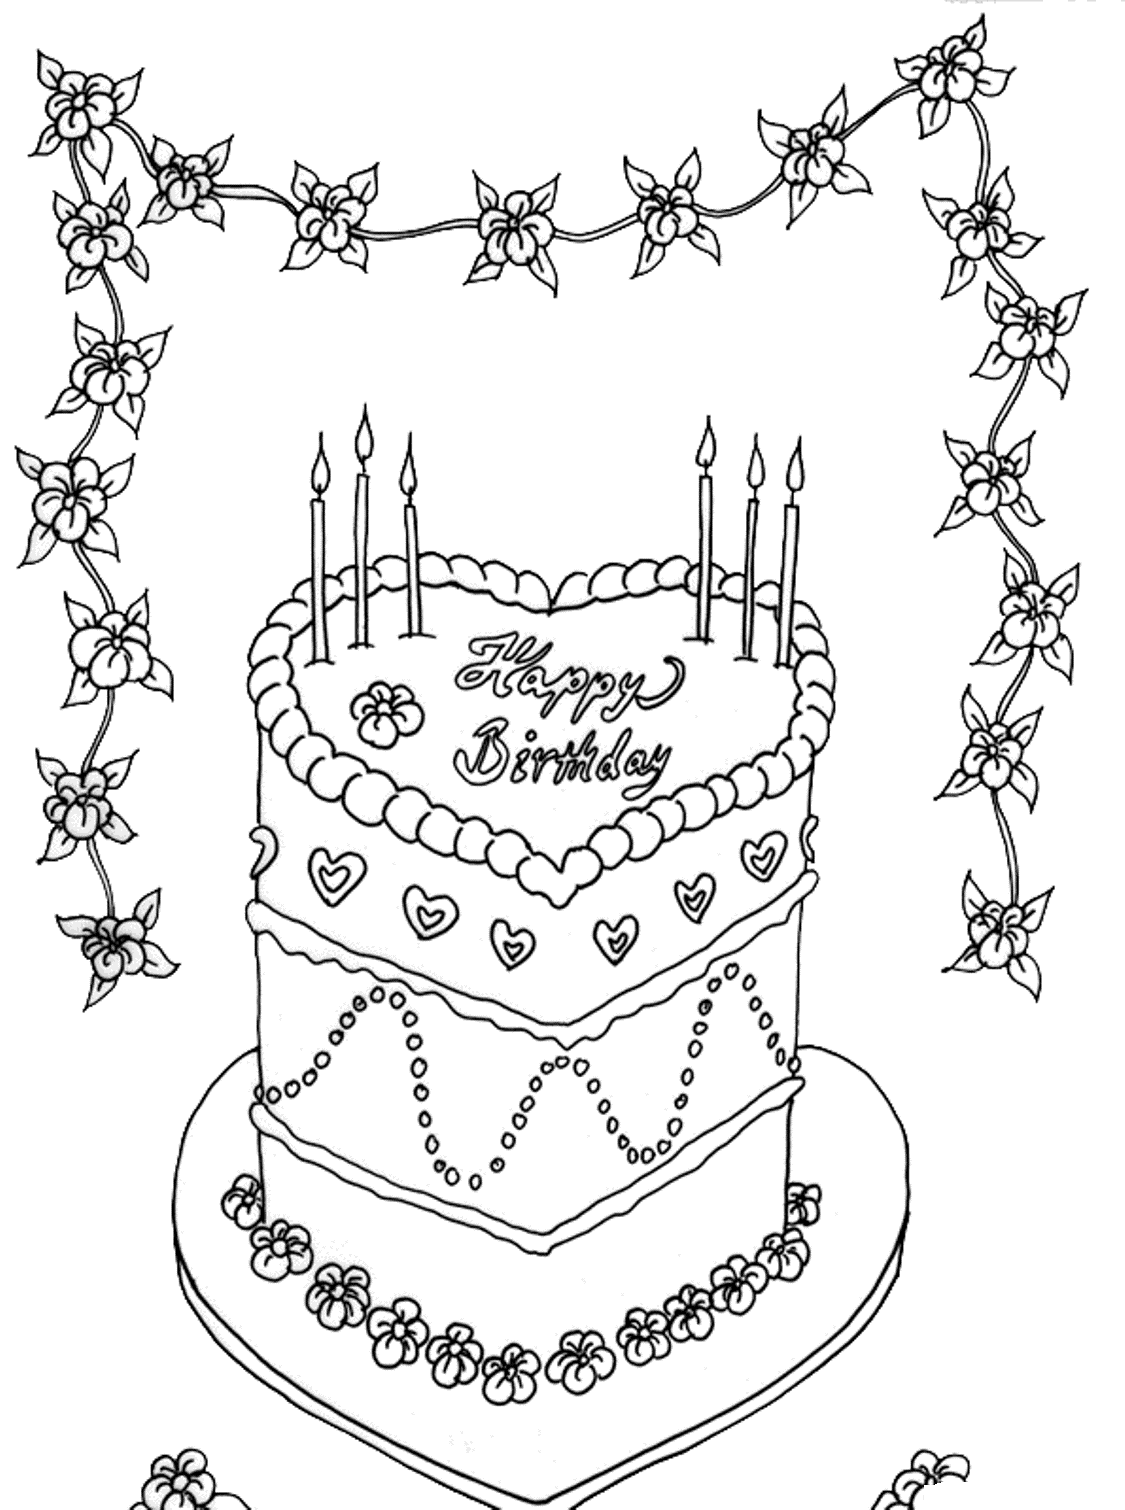 Gambar Mewarnai Kue Ulang Tahun 15